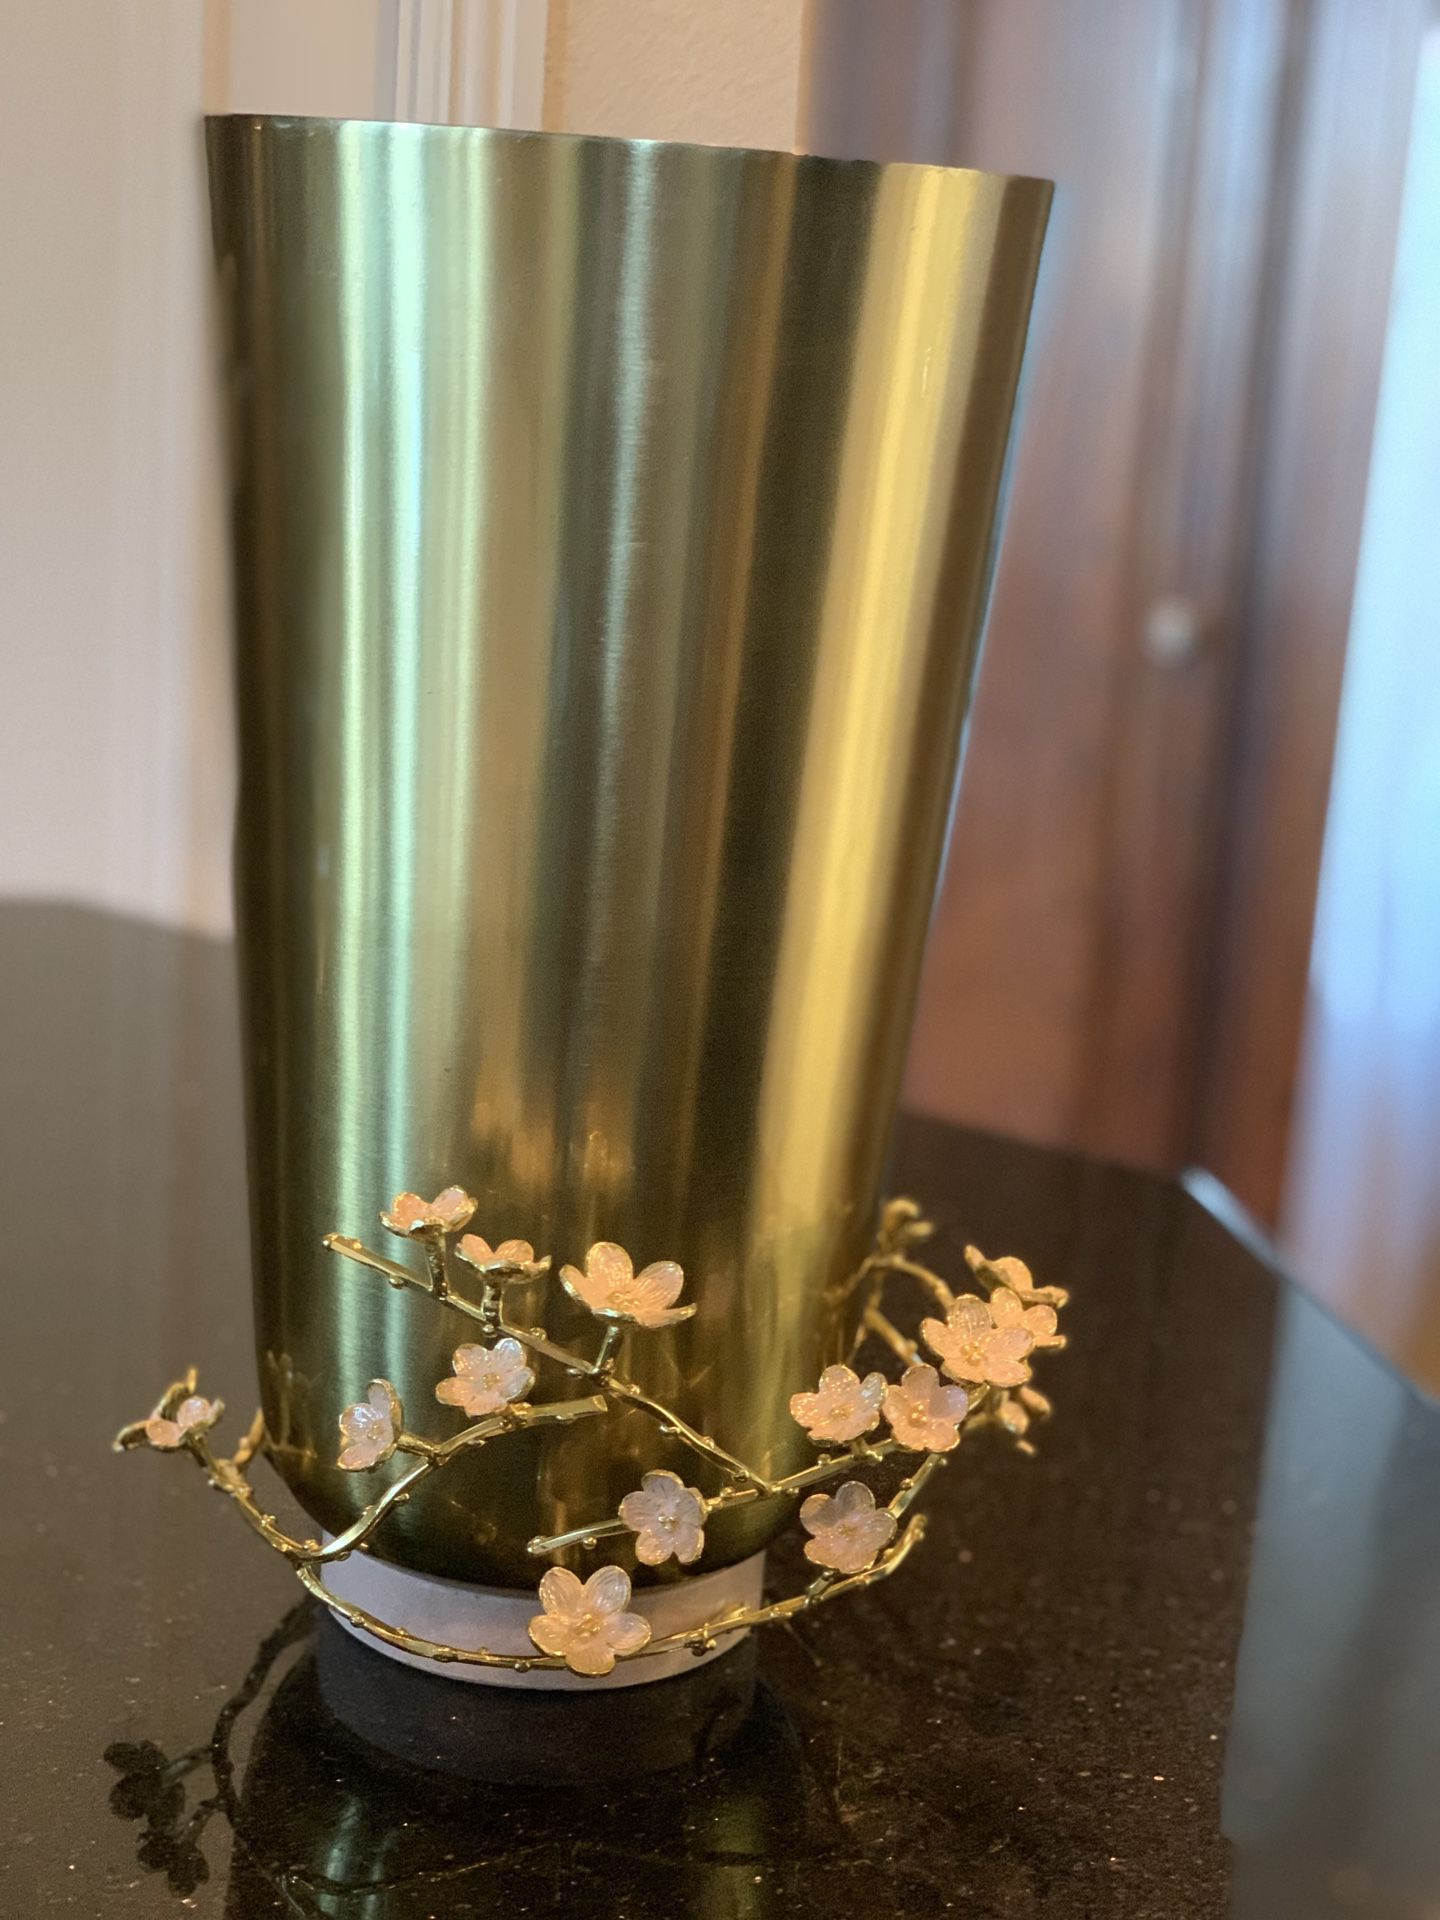 Michael Aram Large Vase